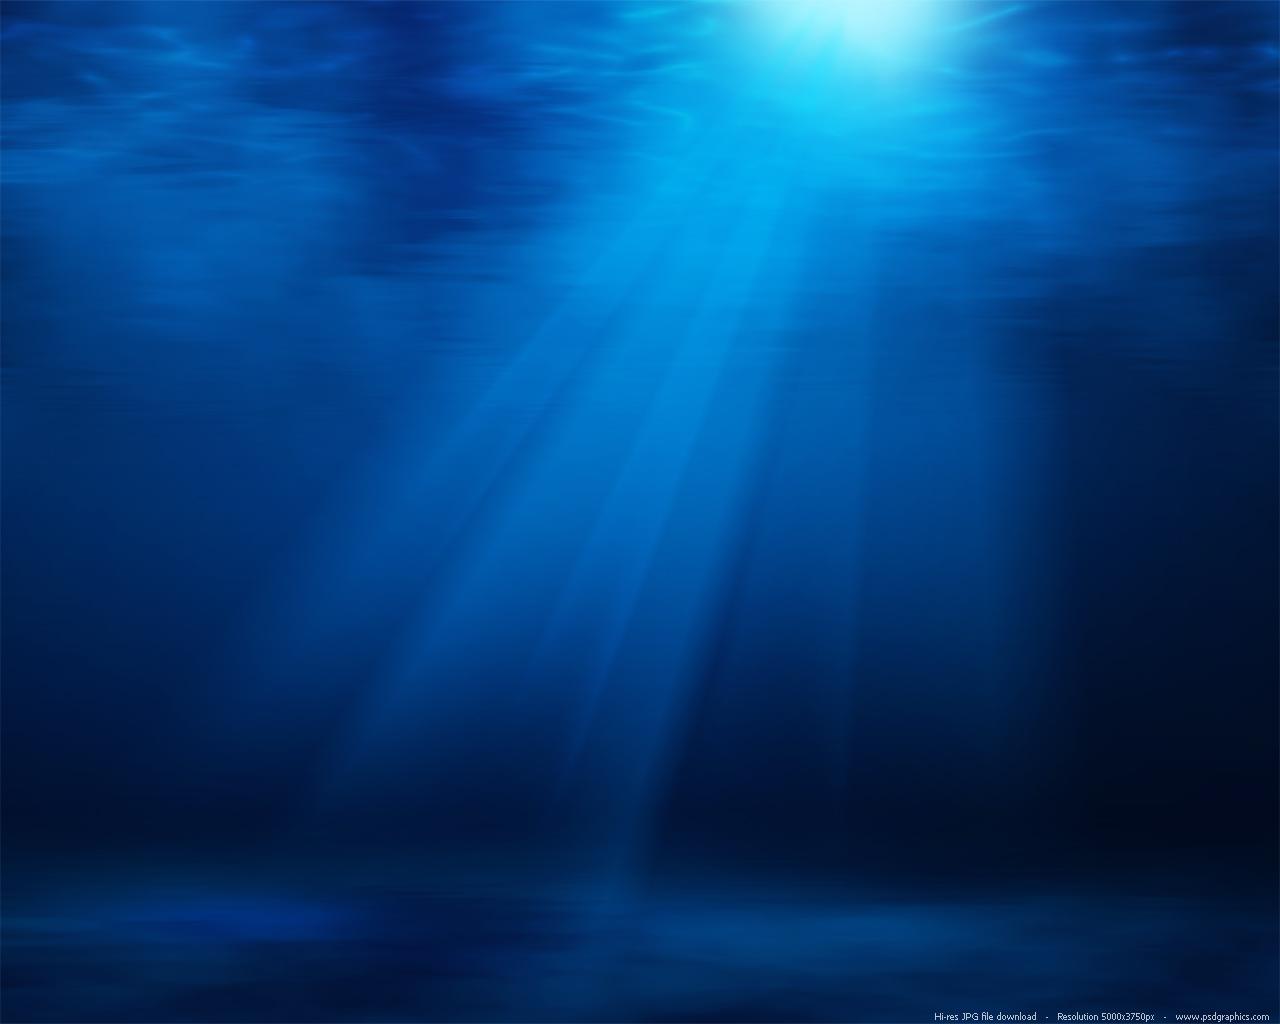 Rays of light under water wallpaper Wallpaper Wide HD 1280x1024